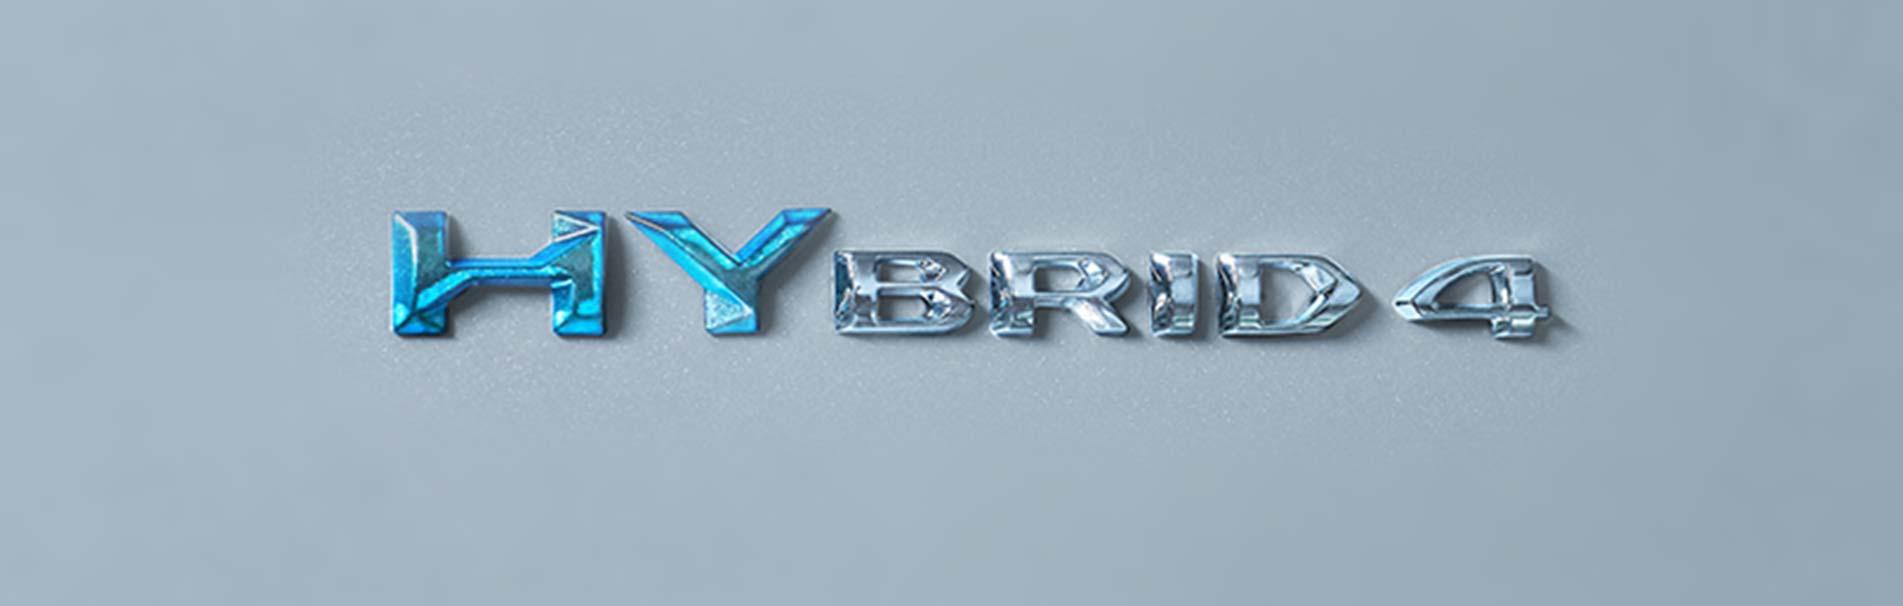 order-your-peugeot-3008-suv-hybrid-4-system-sli